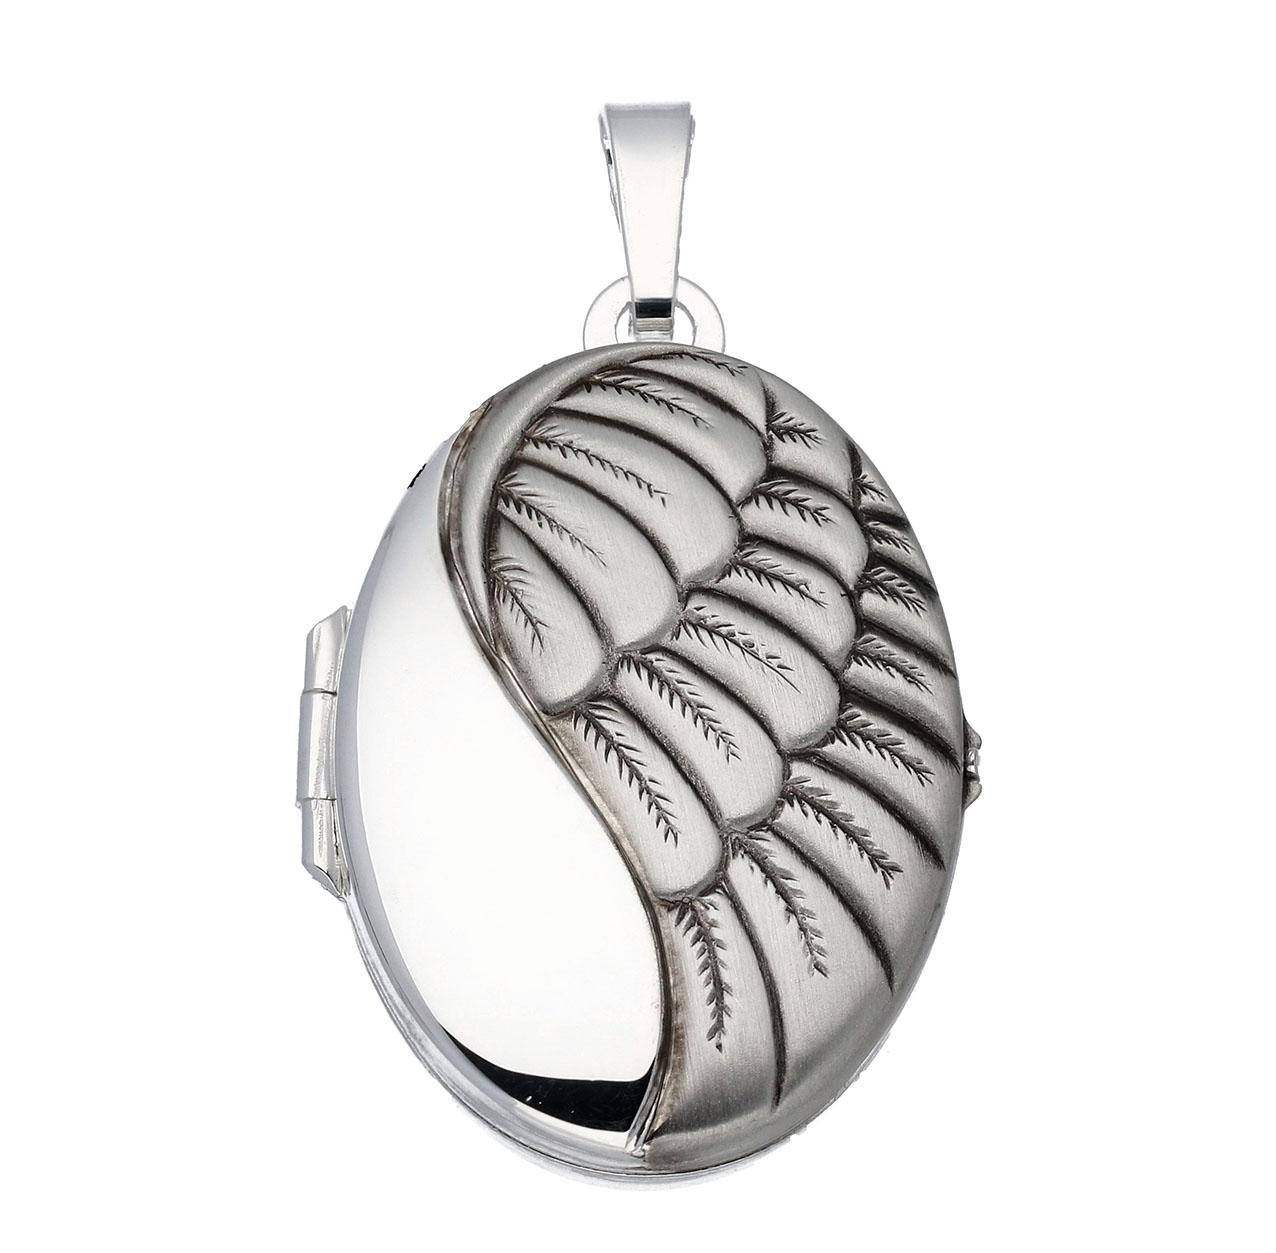 Zilveren Medaillon Ovaal - Vleugel Engel - 22 x 31 mm 145.0099.00